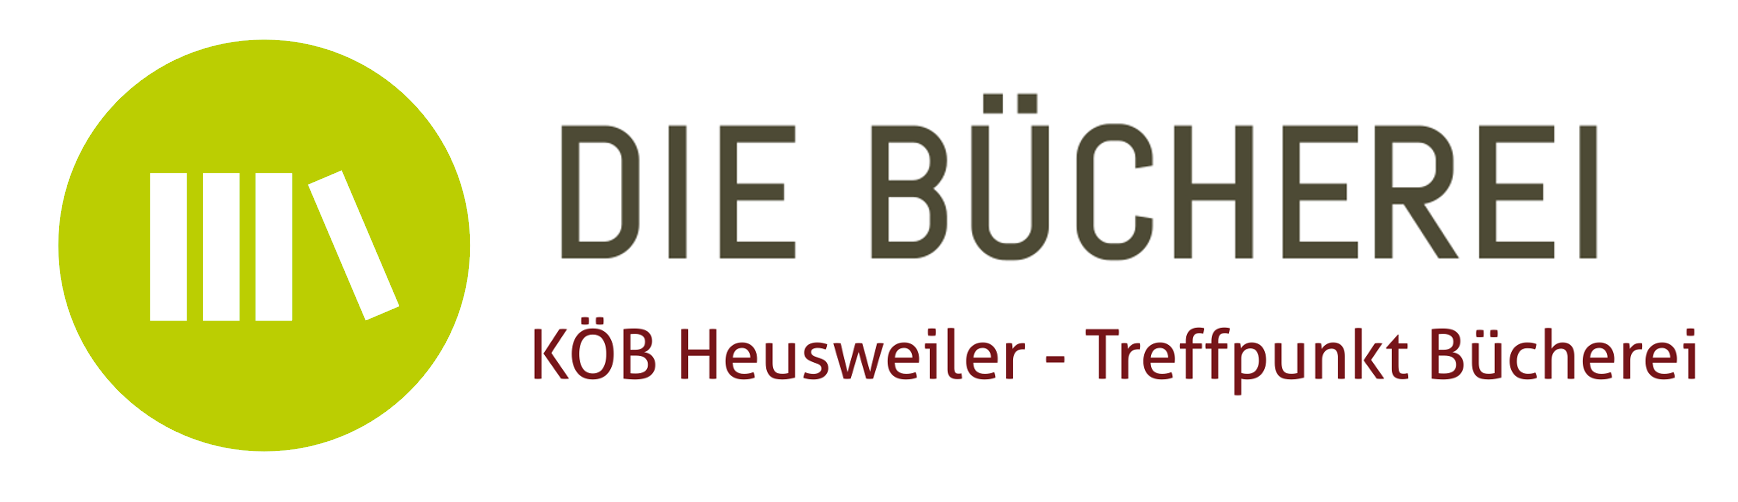 Die BÜCHEREI Koeb-Heusweiler